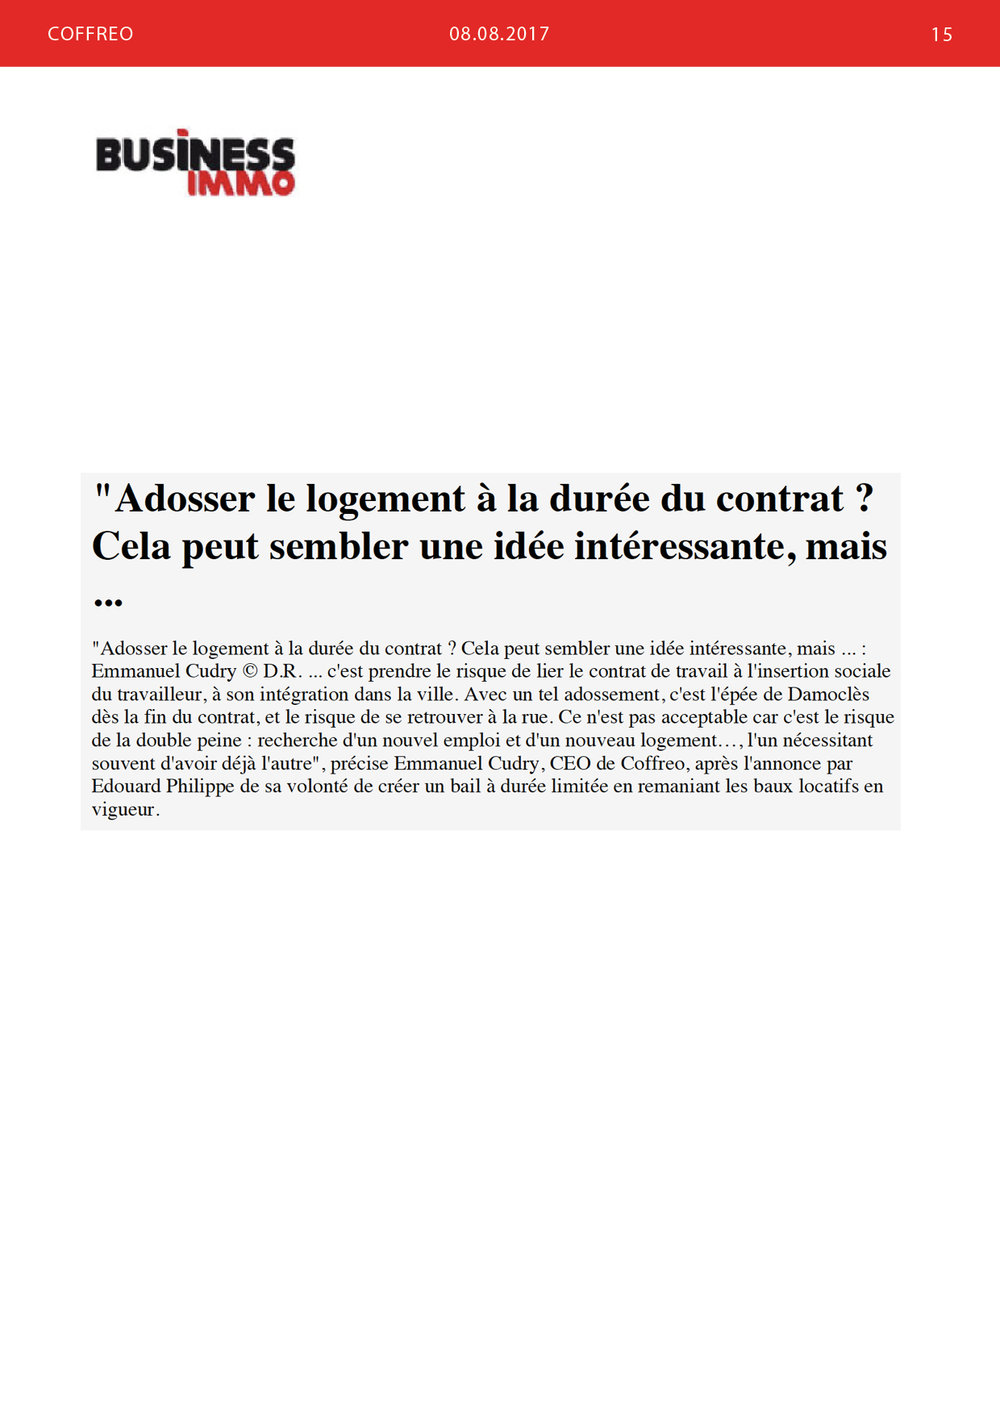 BOOKMEDIA_JAOUT_015.jpg